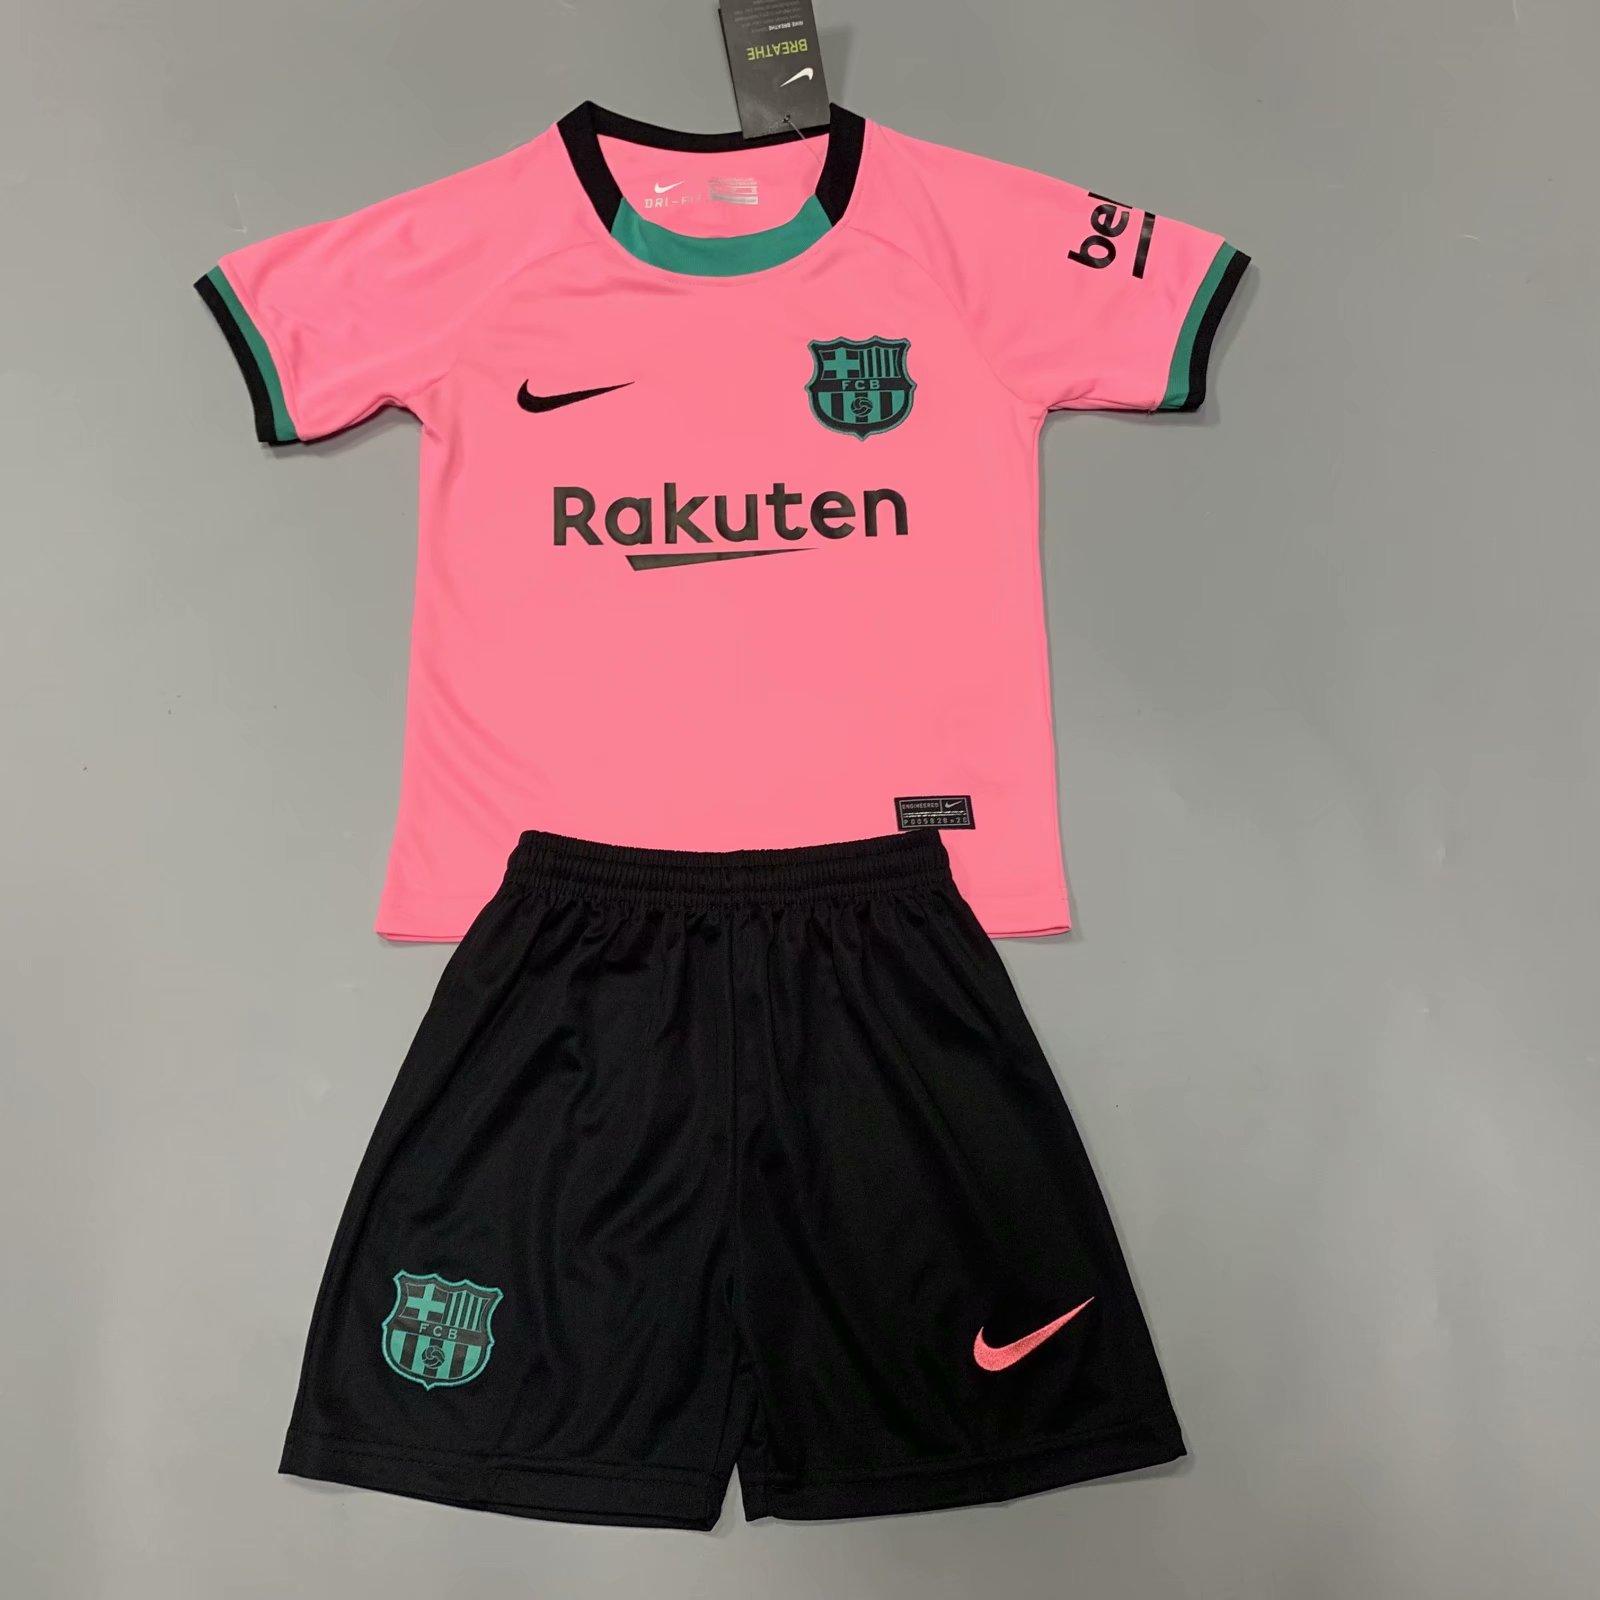 Barcelona 20/21 Kids Third Soccer Jersey and Short Kit